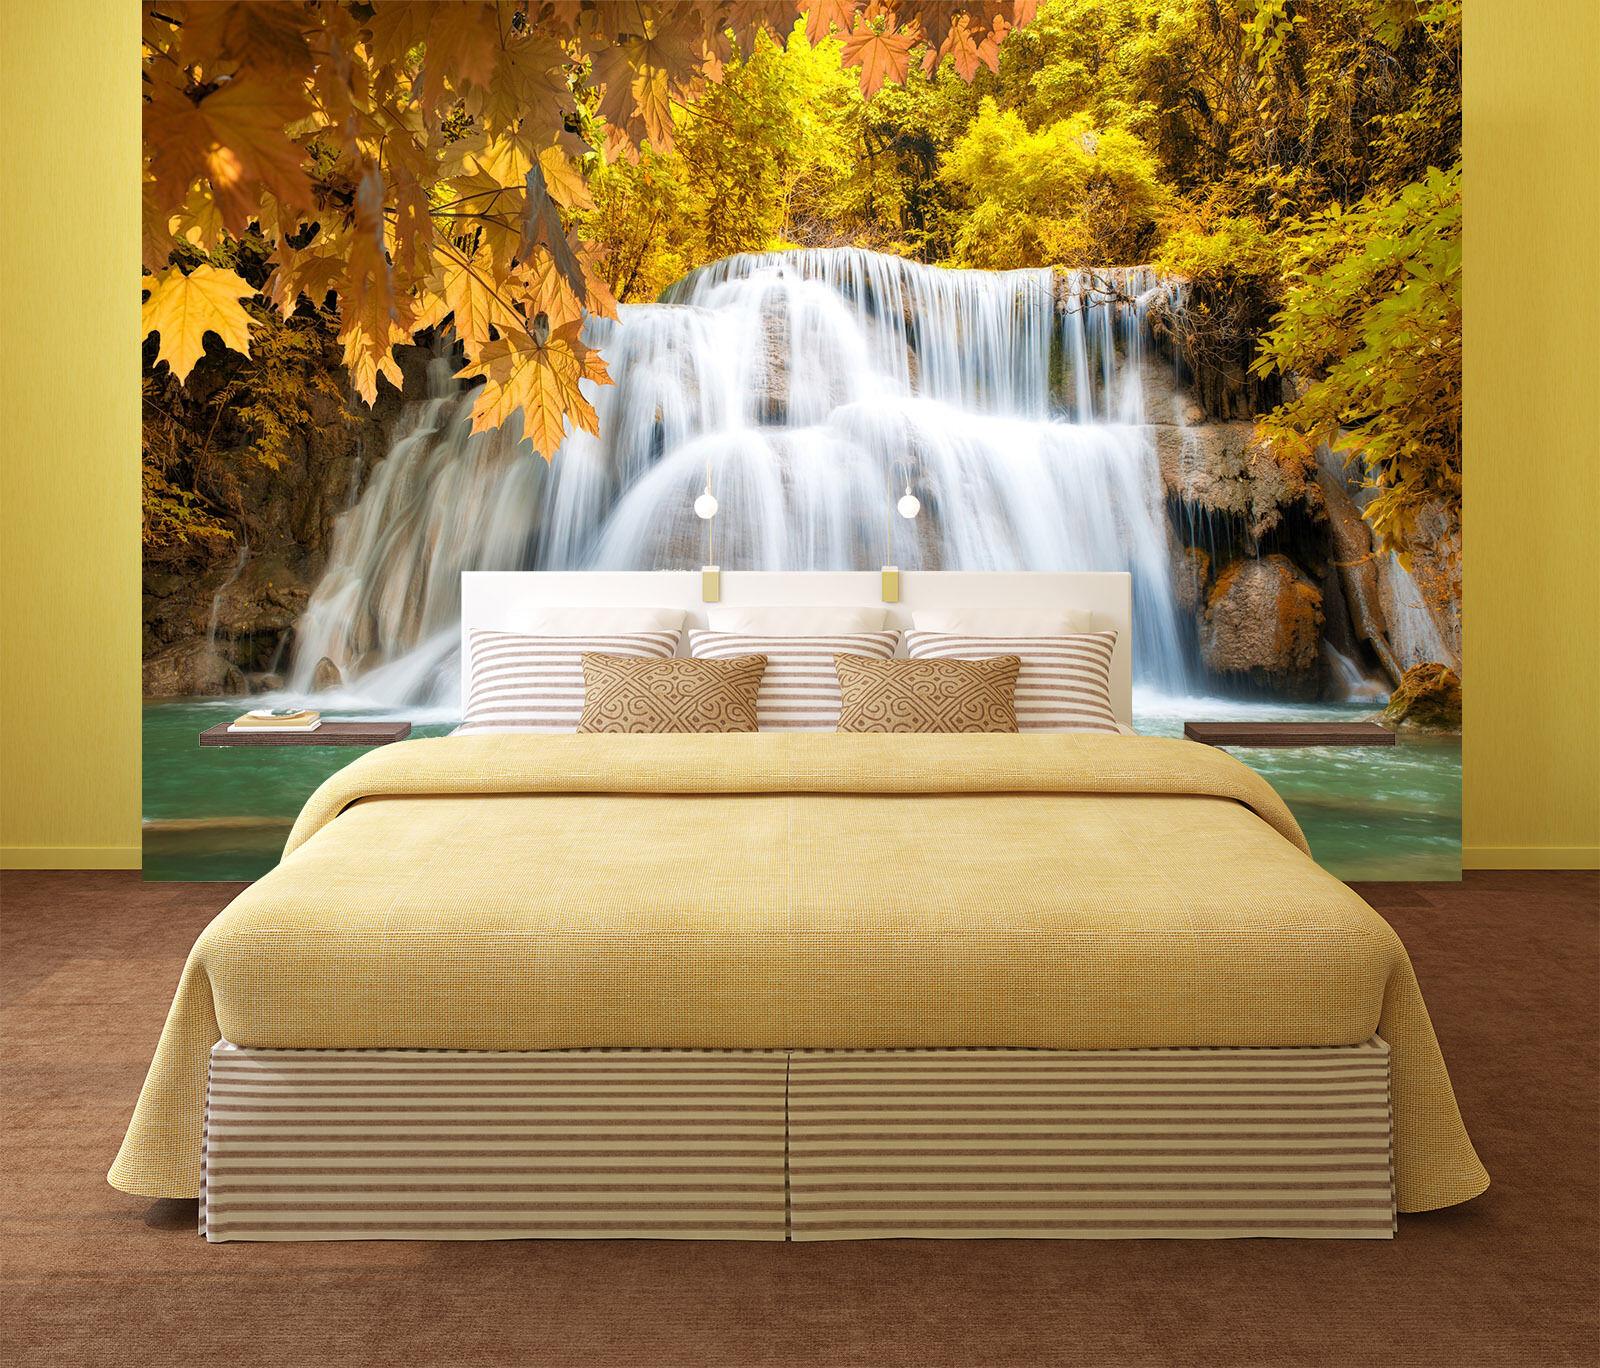 3D Waterfall leaf 2312 Wall Paper Wall Print Decal Decal Decal Wall Deco Indoor Wall Murals 652f1f